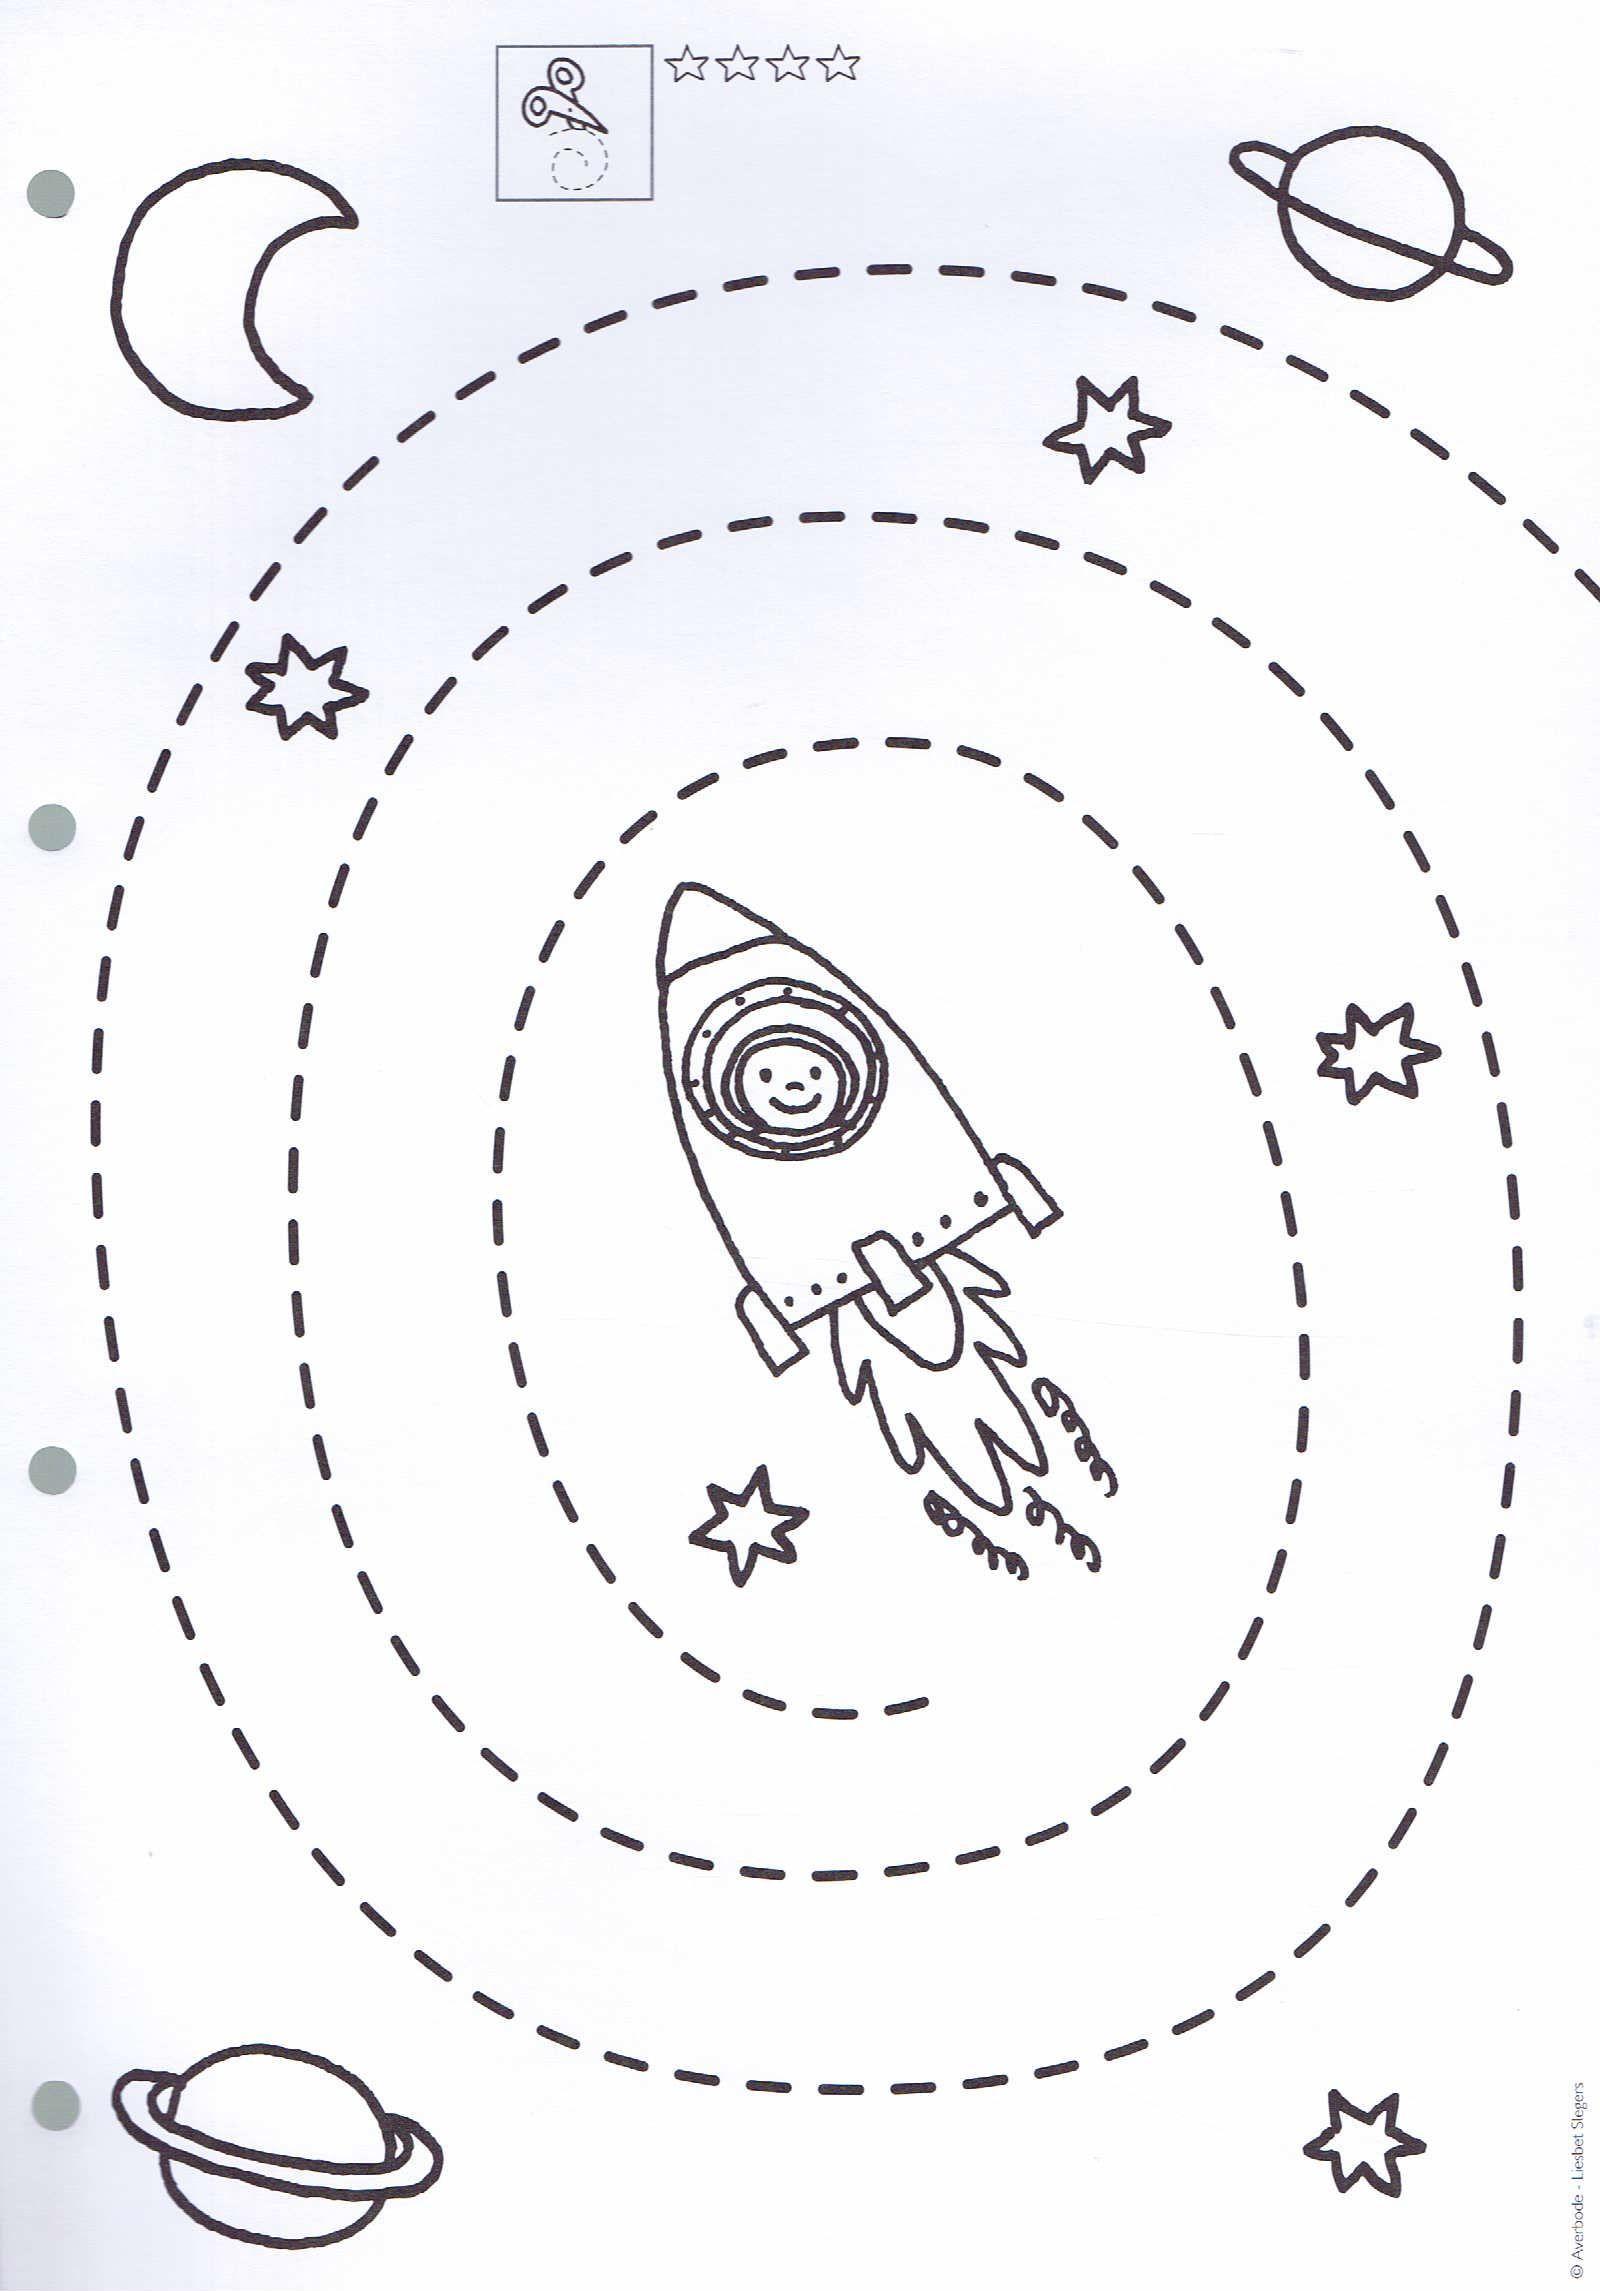 D6300b546755e0eb050e8f4a617dac0e Jpg 1600 2291 Space Preschool Preschool Learning Activities Preschool [ 2291 x 1600 Pixel ]